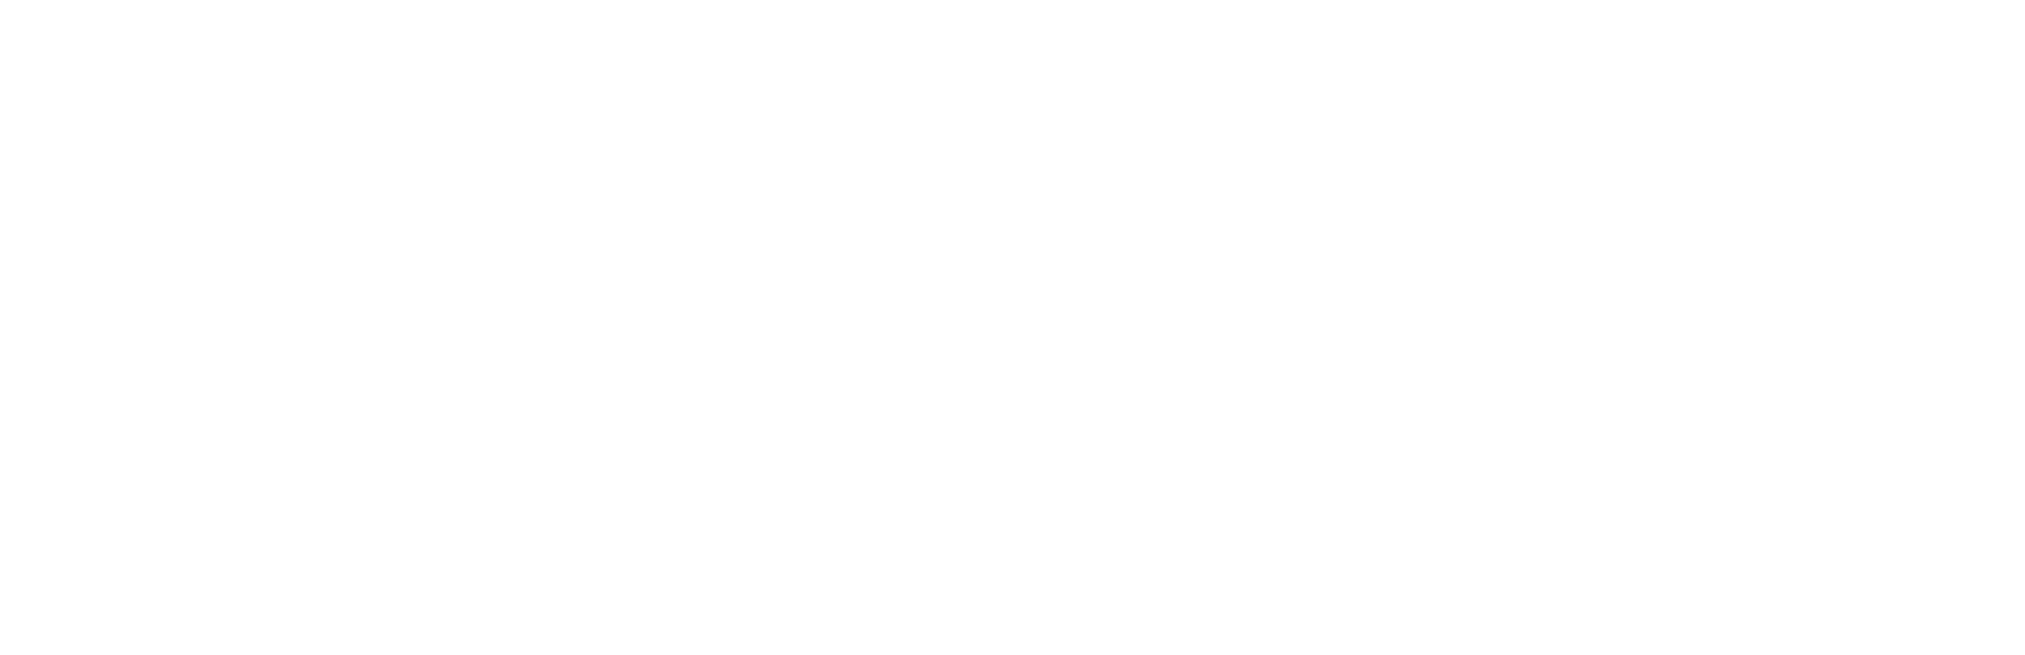 Artepaliativo